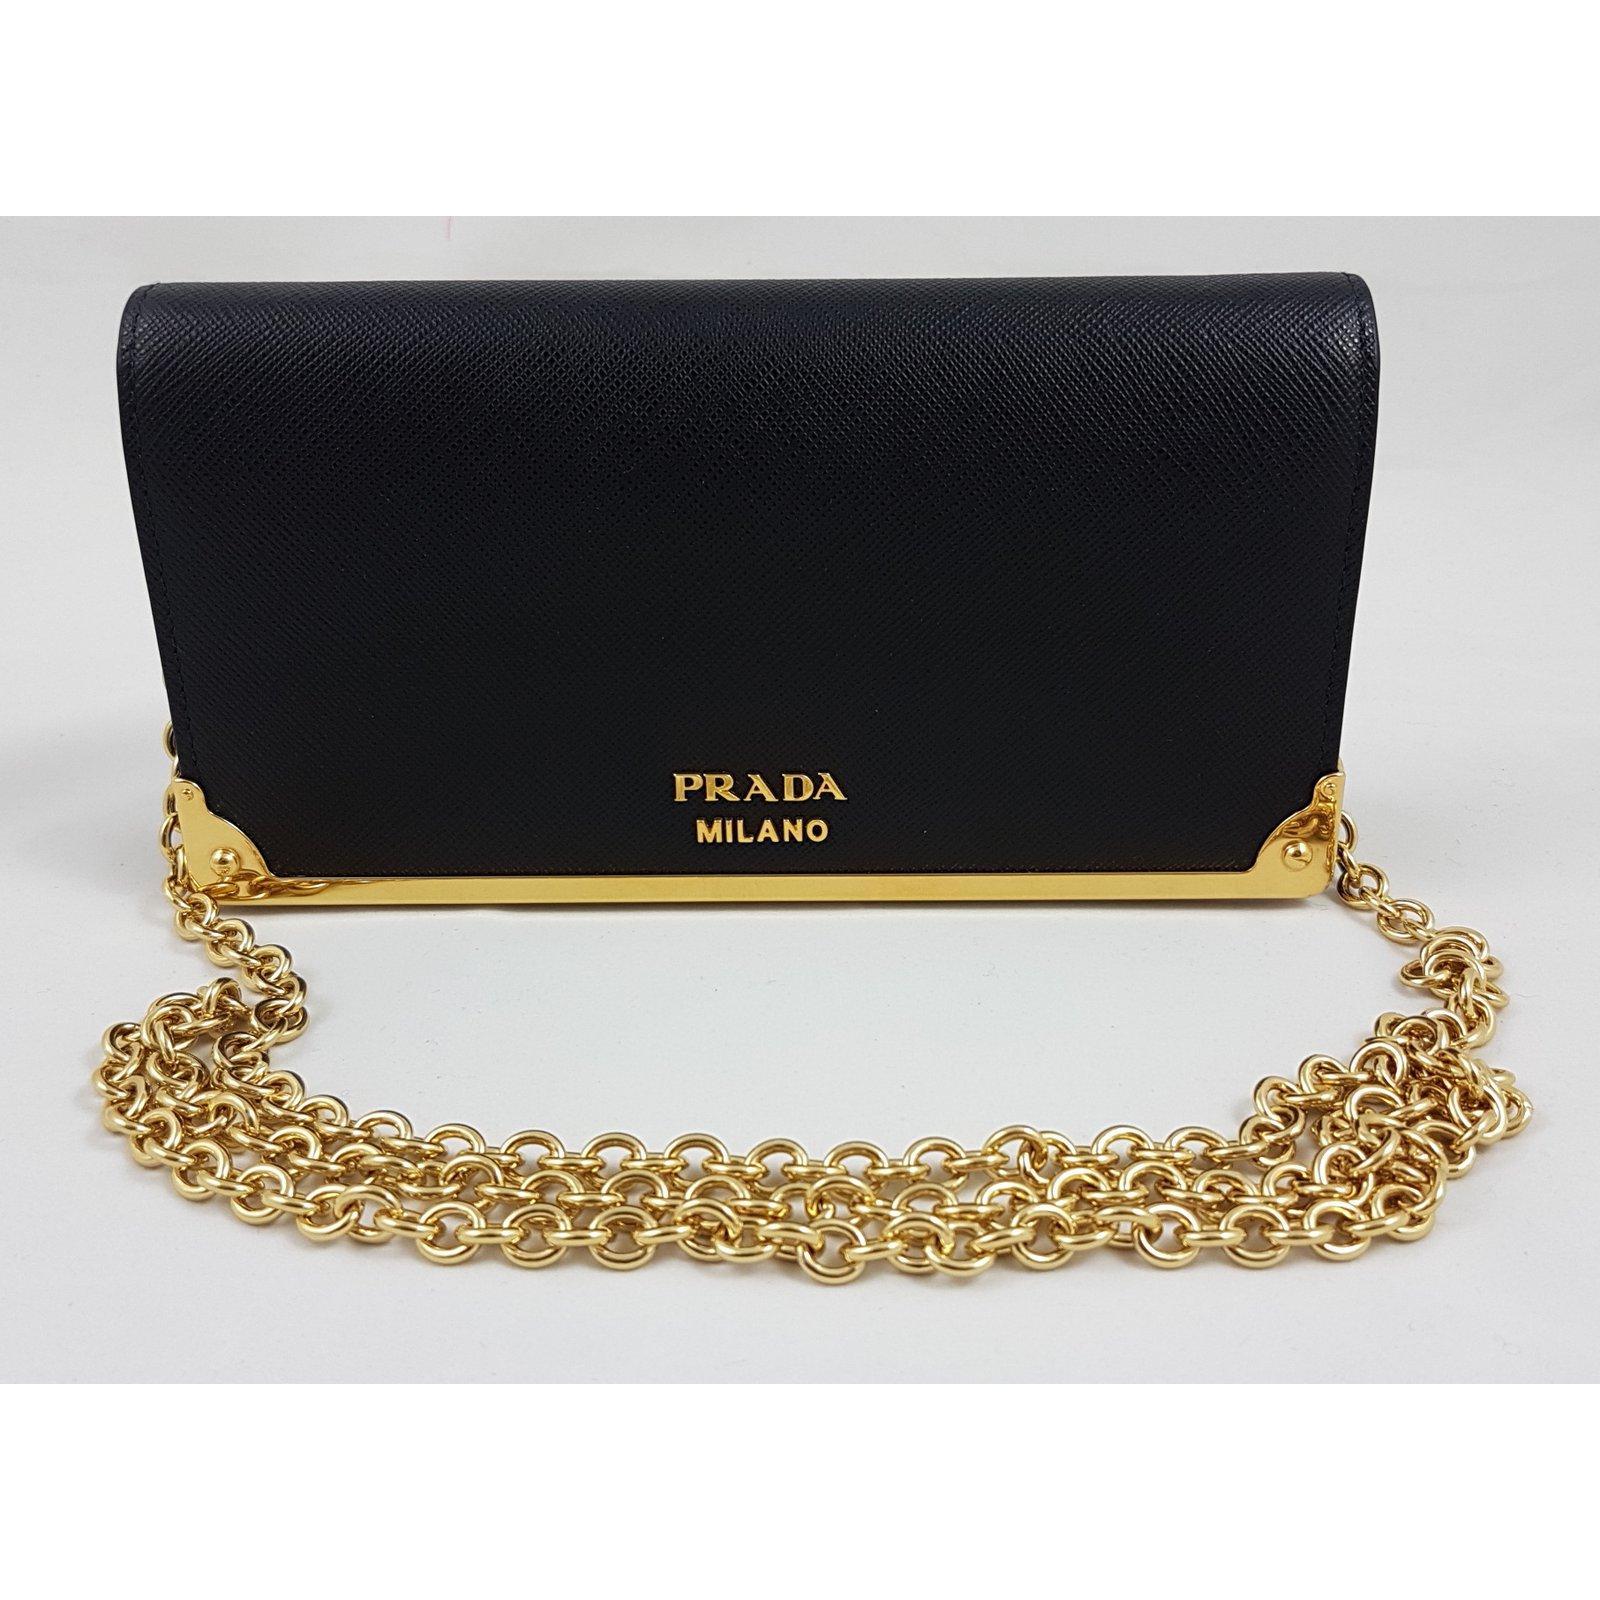 99eead1466 ... uk prada prada wallet on chain purses wallets cases leather black  ref.59353 joli closet